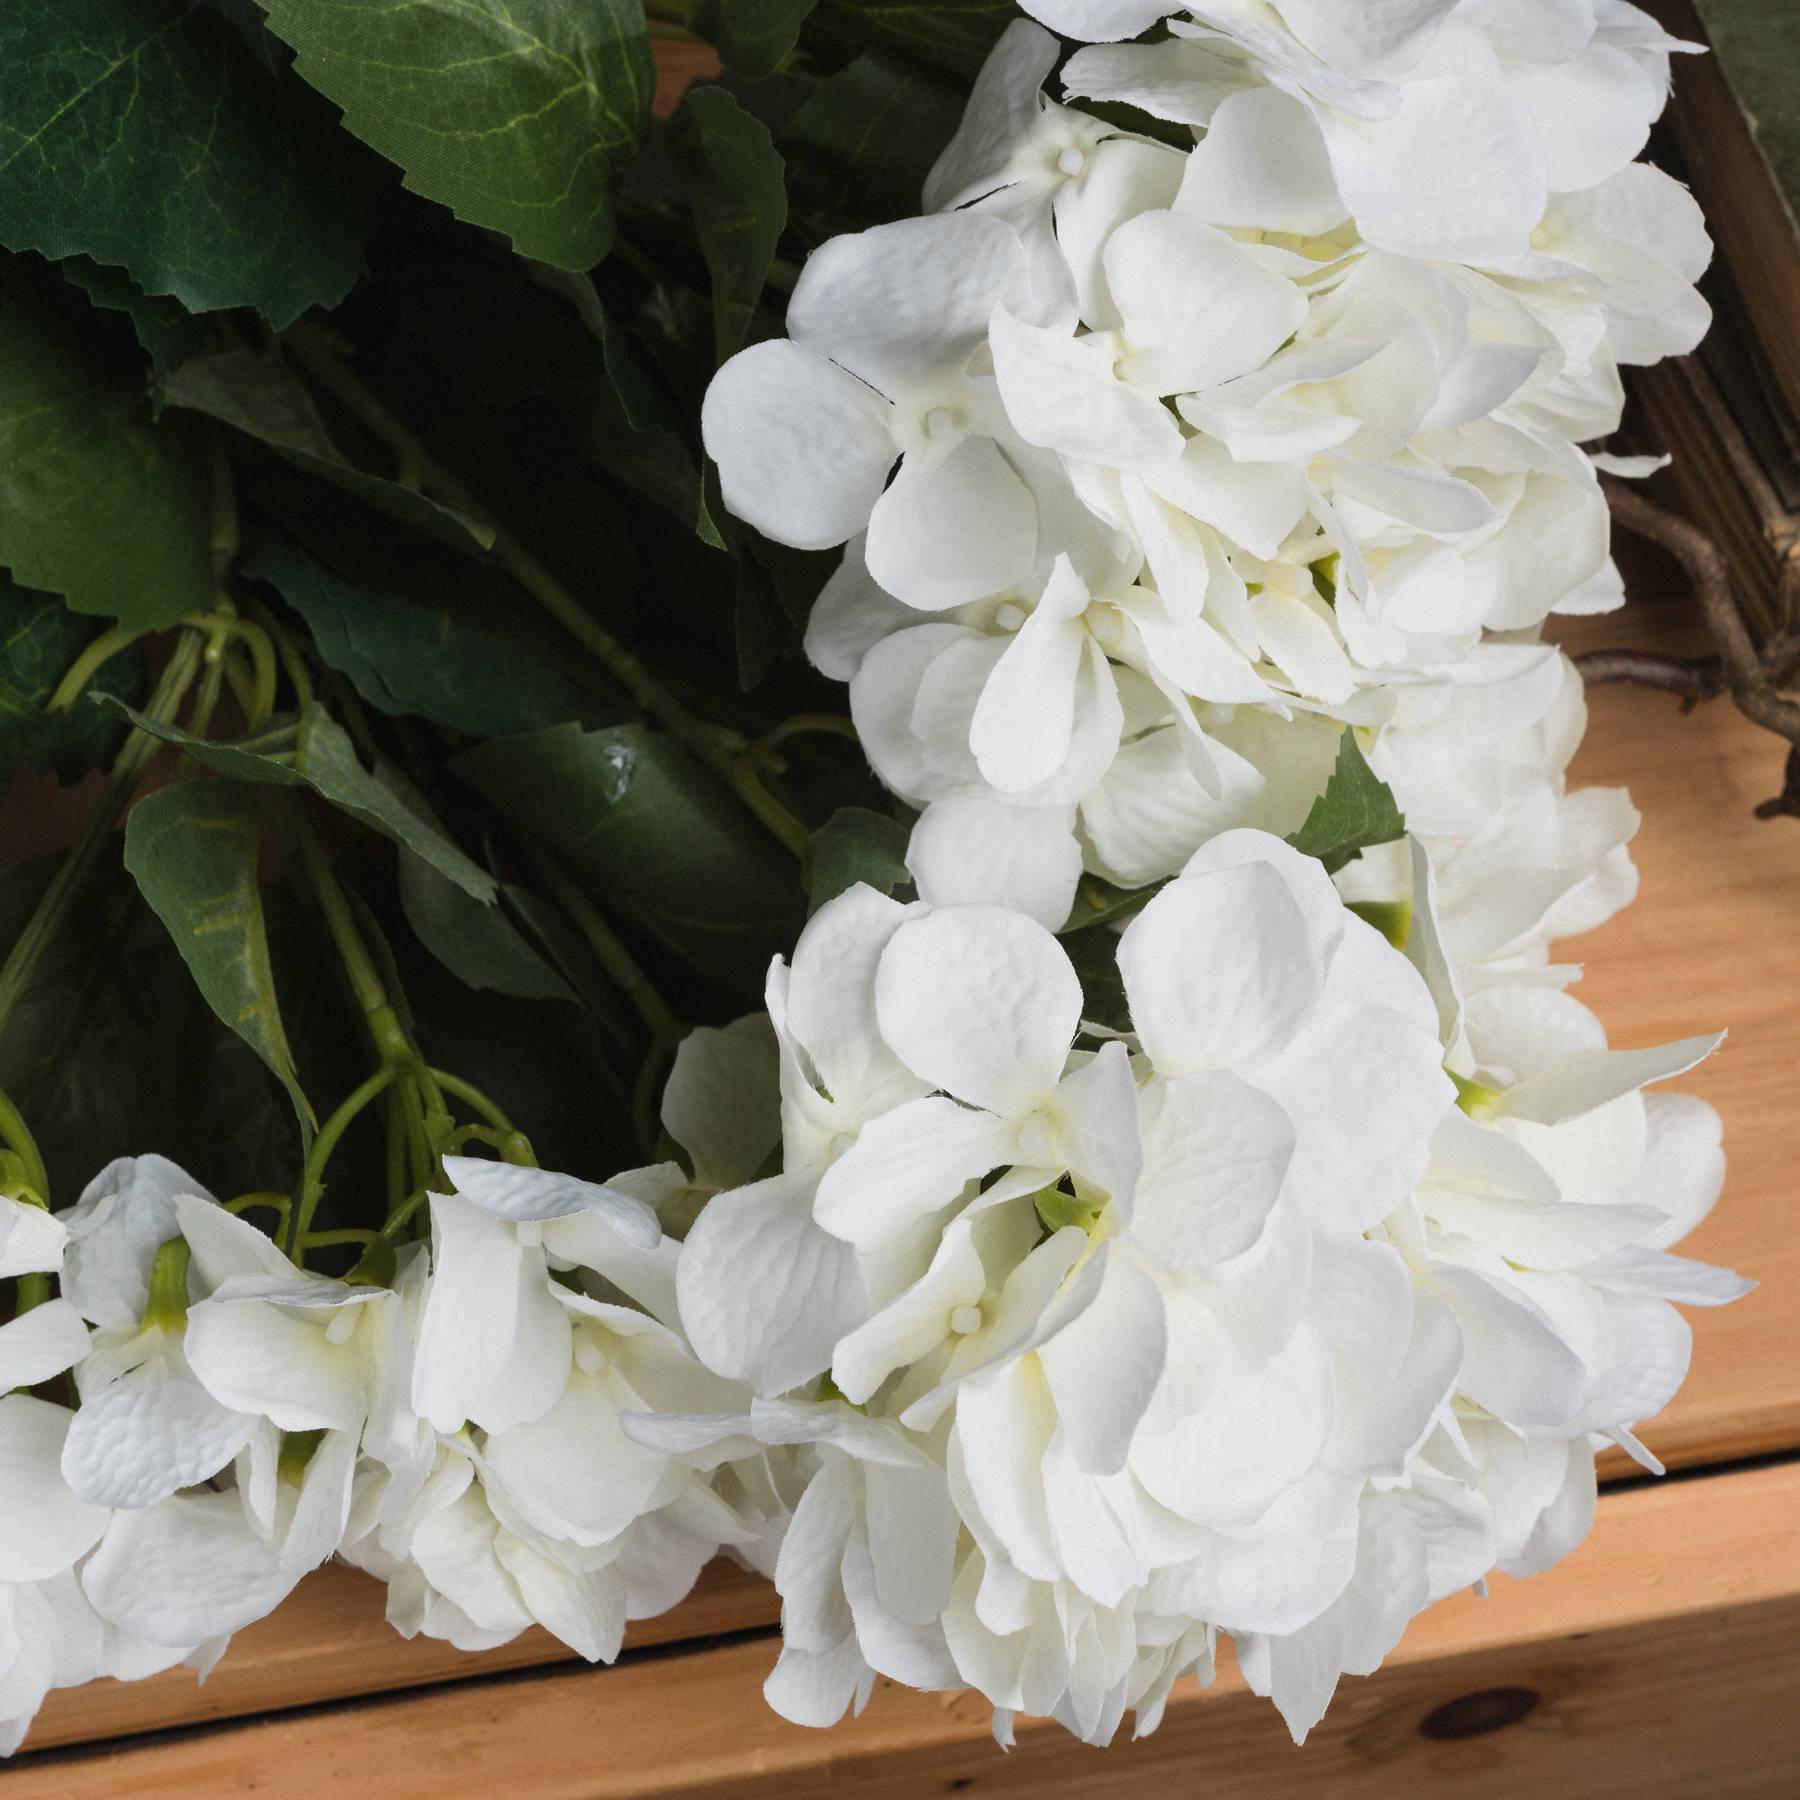 White Hydrangea Bouquet - Image 3